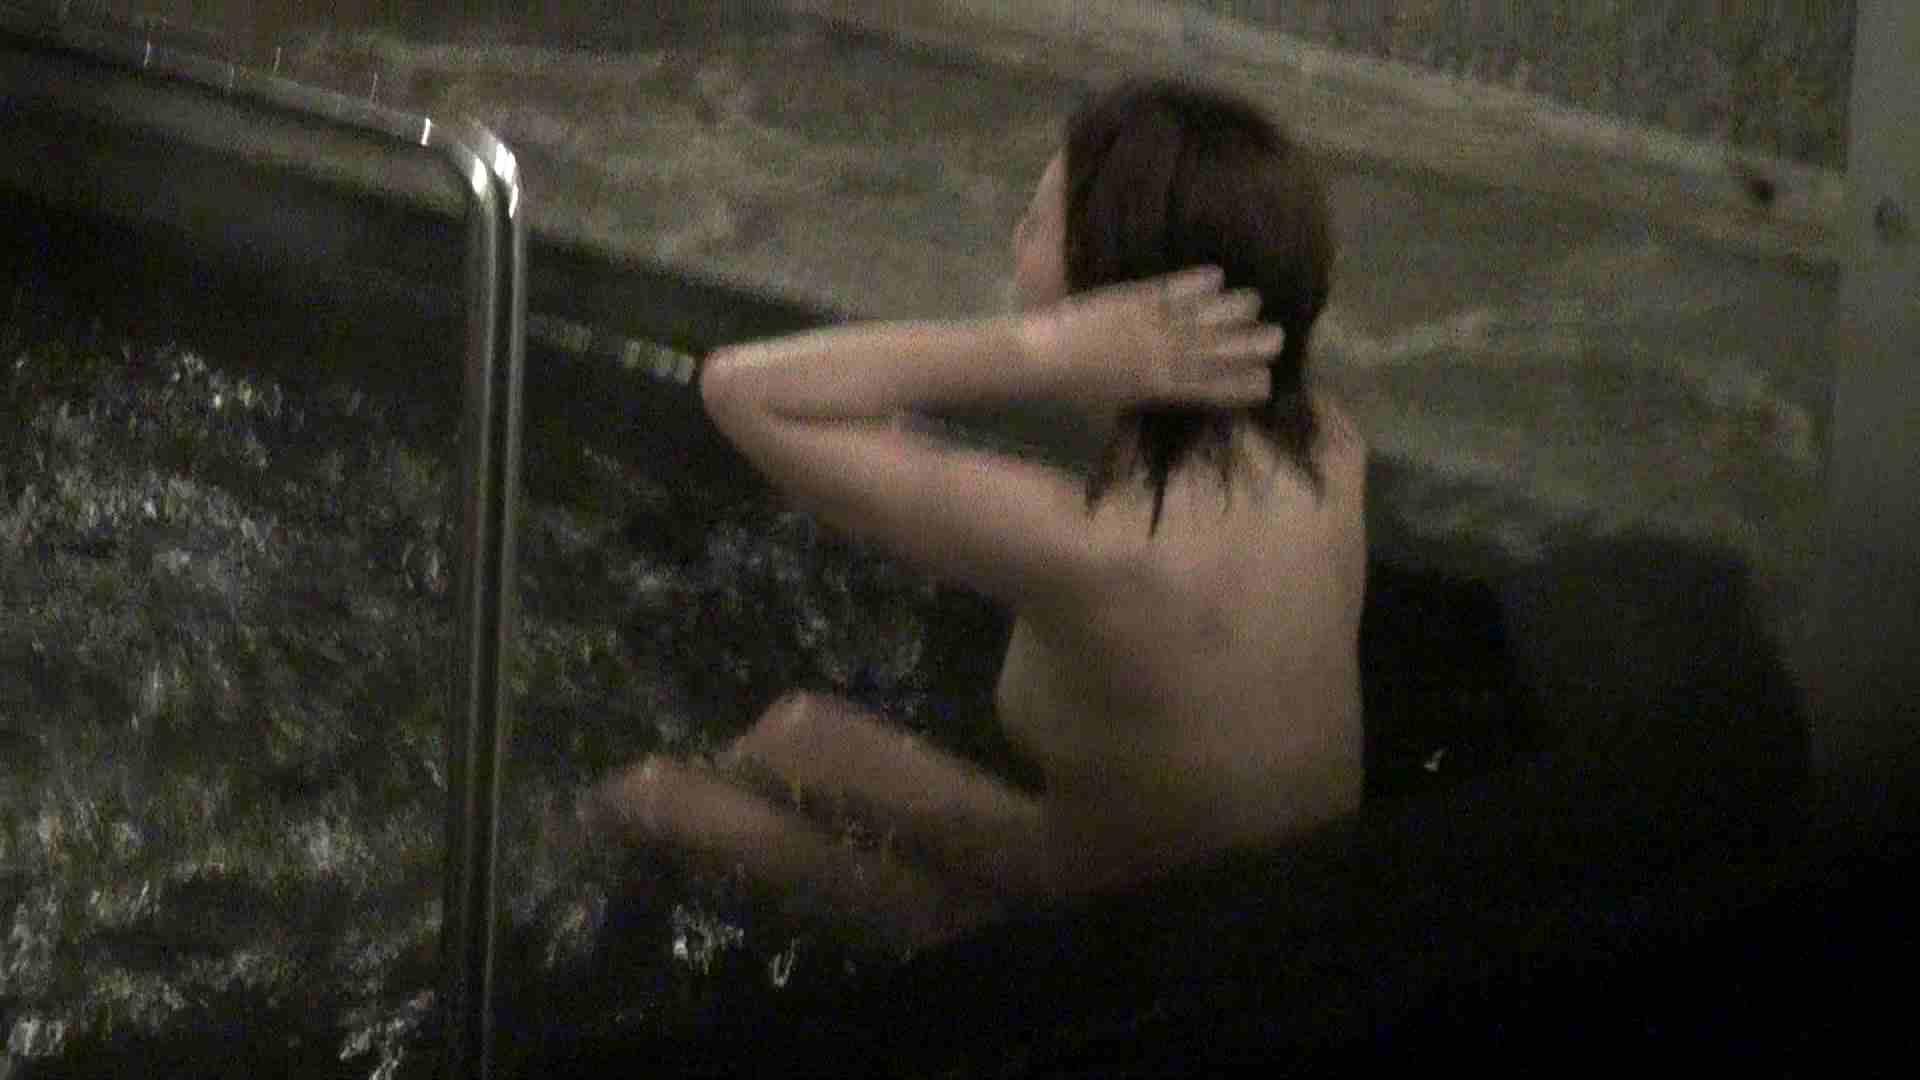 Aquaな露天風呂Vol.411 OLのエロ生活   露天風呂  79連発 73